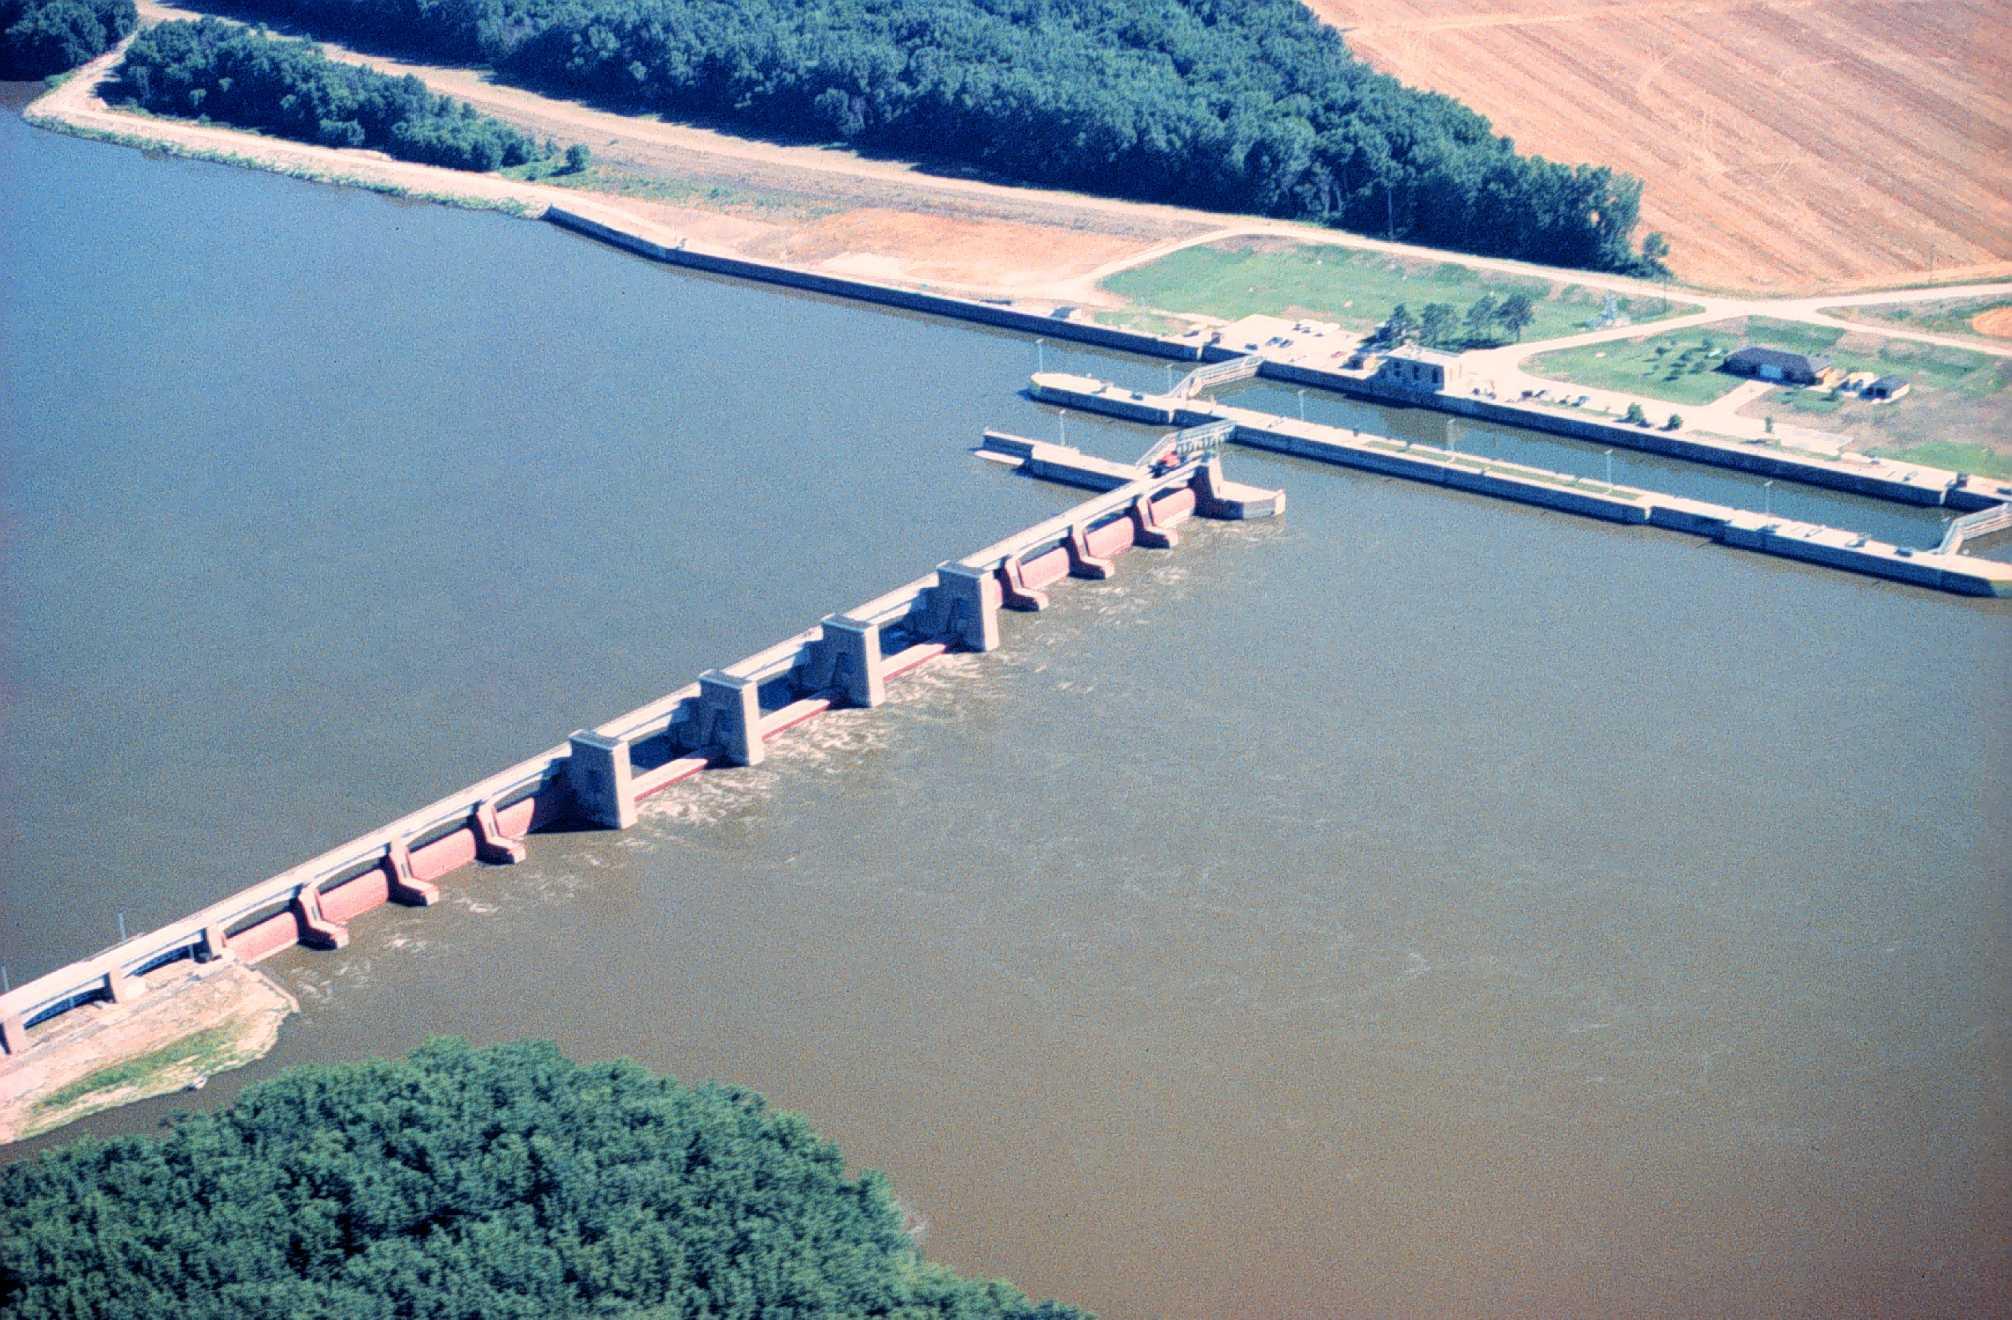 a description of the mississippi river Mississippi river: mississippi river of climate and soil rather than of the river, the mississippi's swamps and s evocative description of the antebellum.